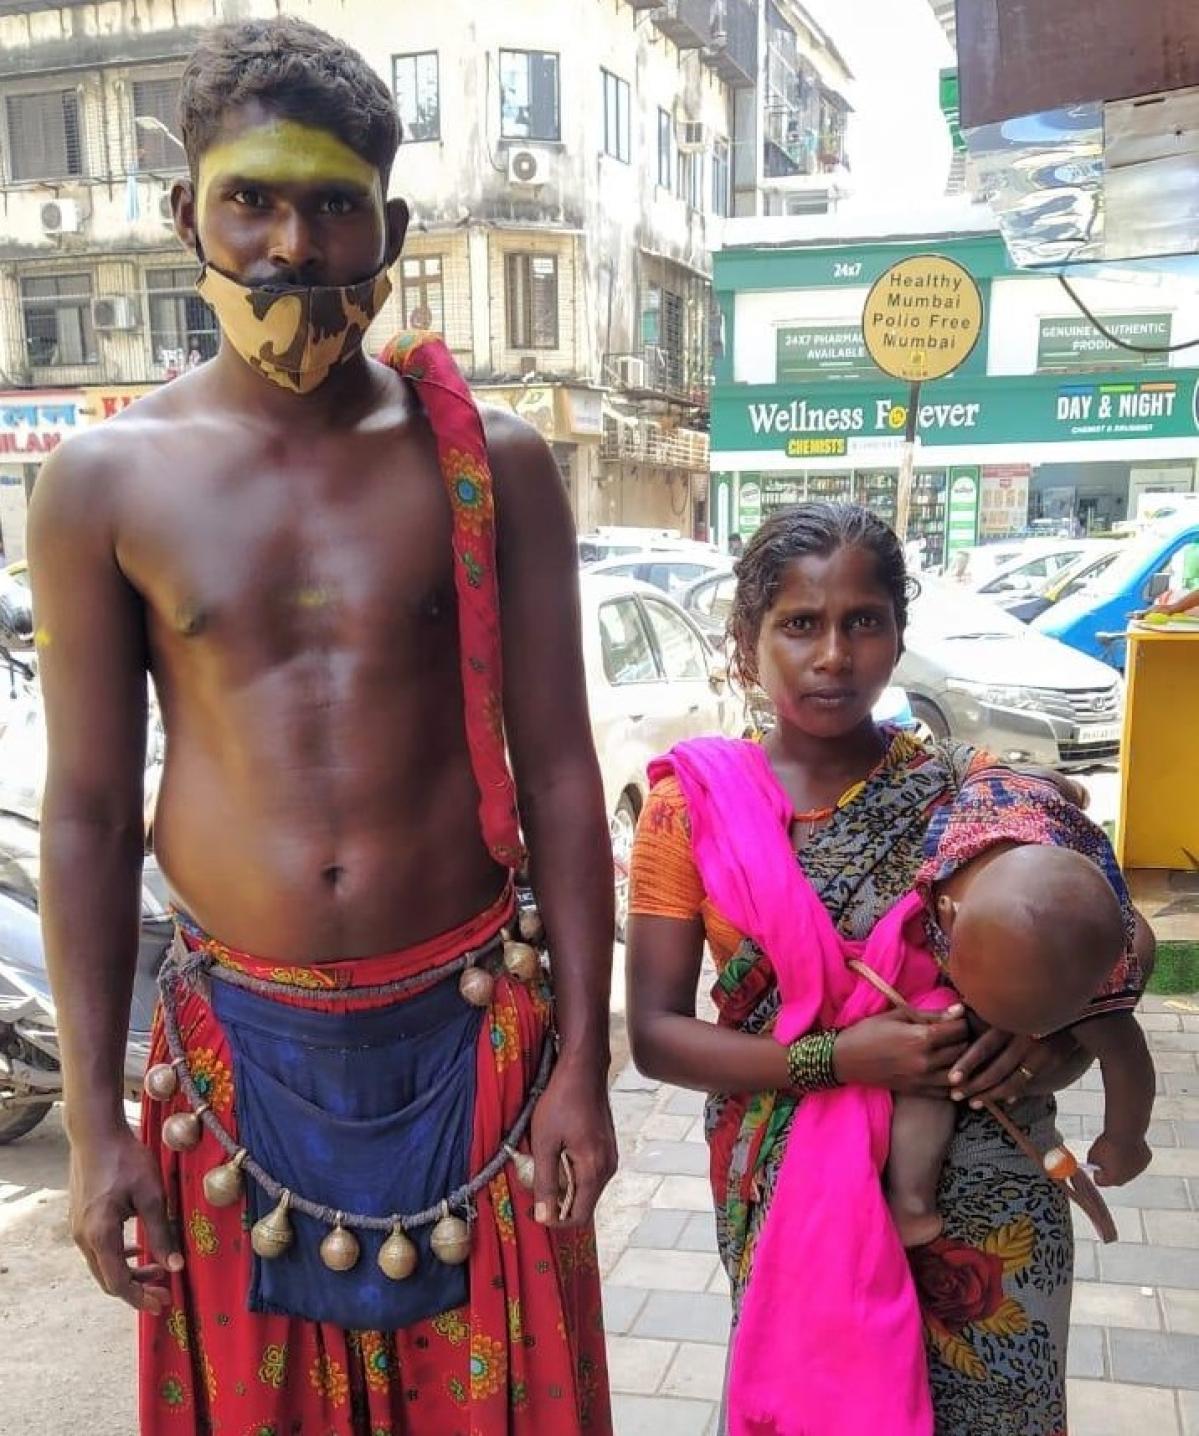 Chabukwala Nagesh with wife and son